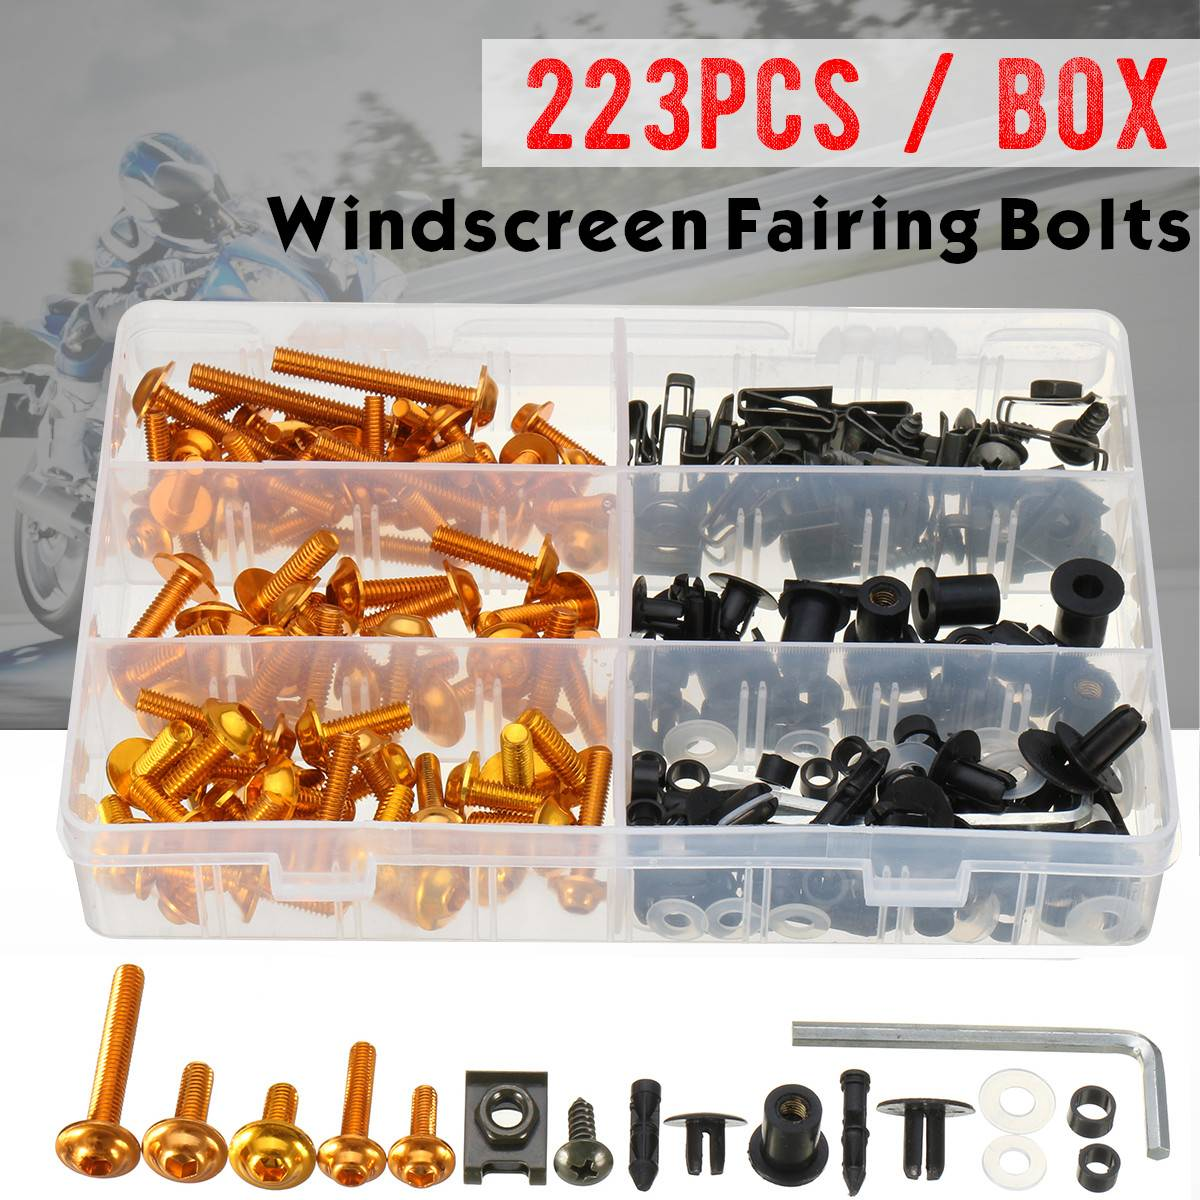 223pcs Universal Motorcycle Windscreen Body Fairing Bolts Windshield Fastener Clips Screws For Honda/Yamaha/Suzuki